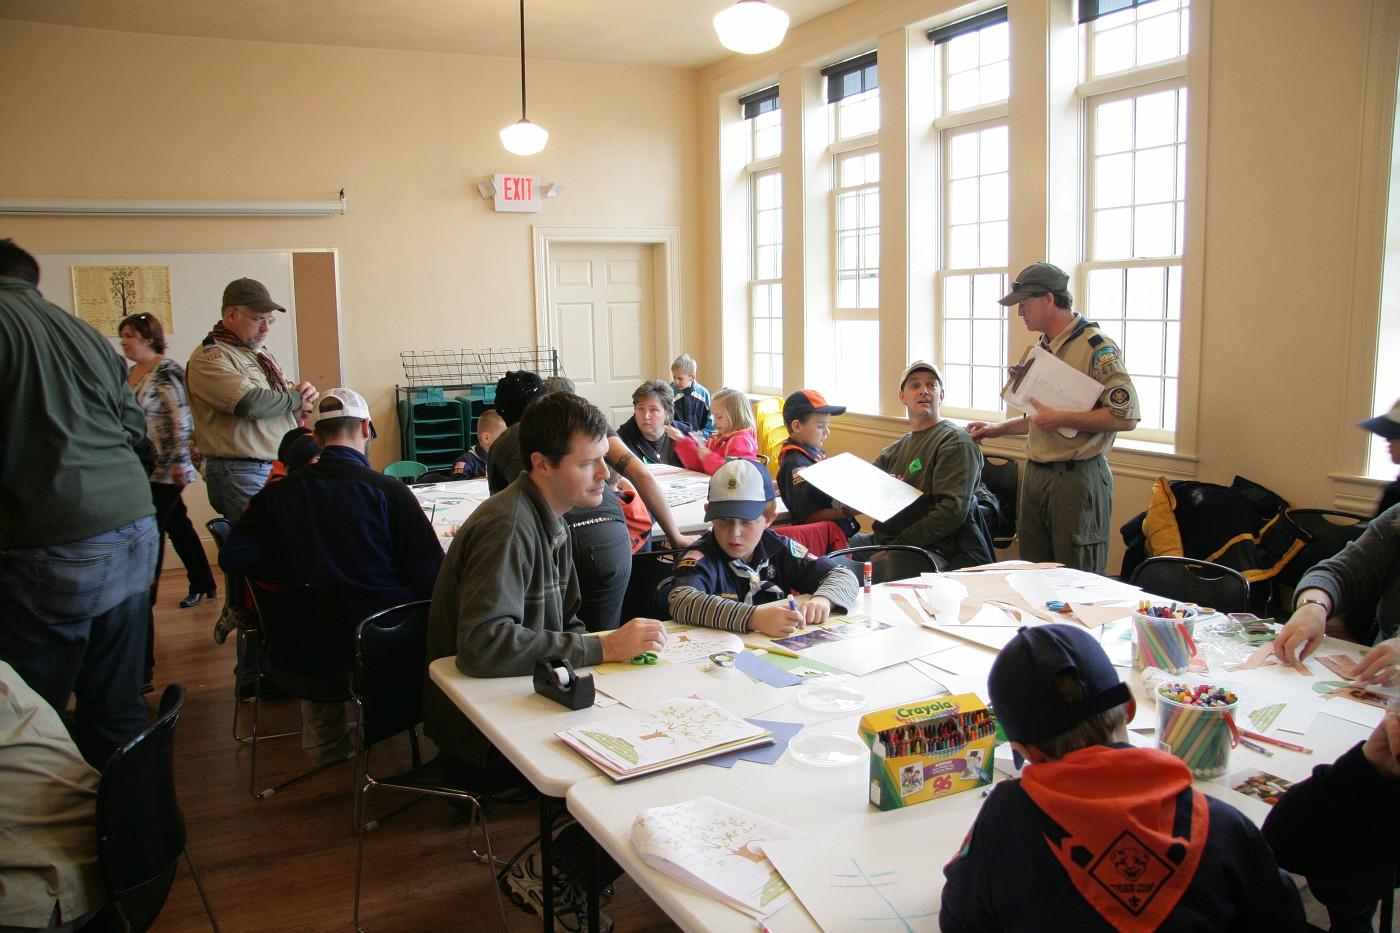 11-21-10 Cub Scouts to HQ019